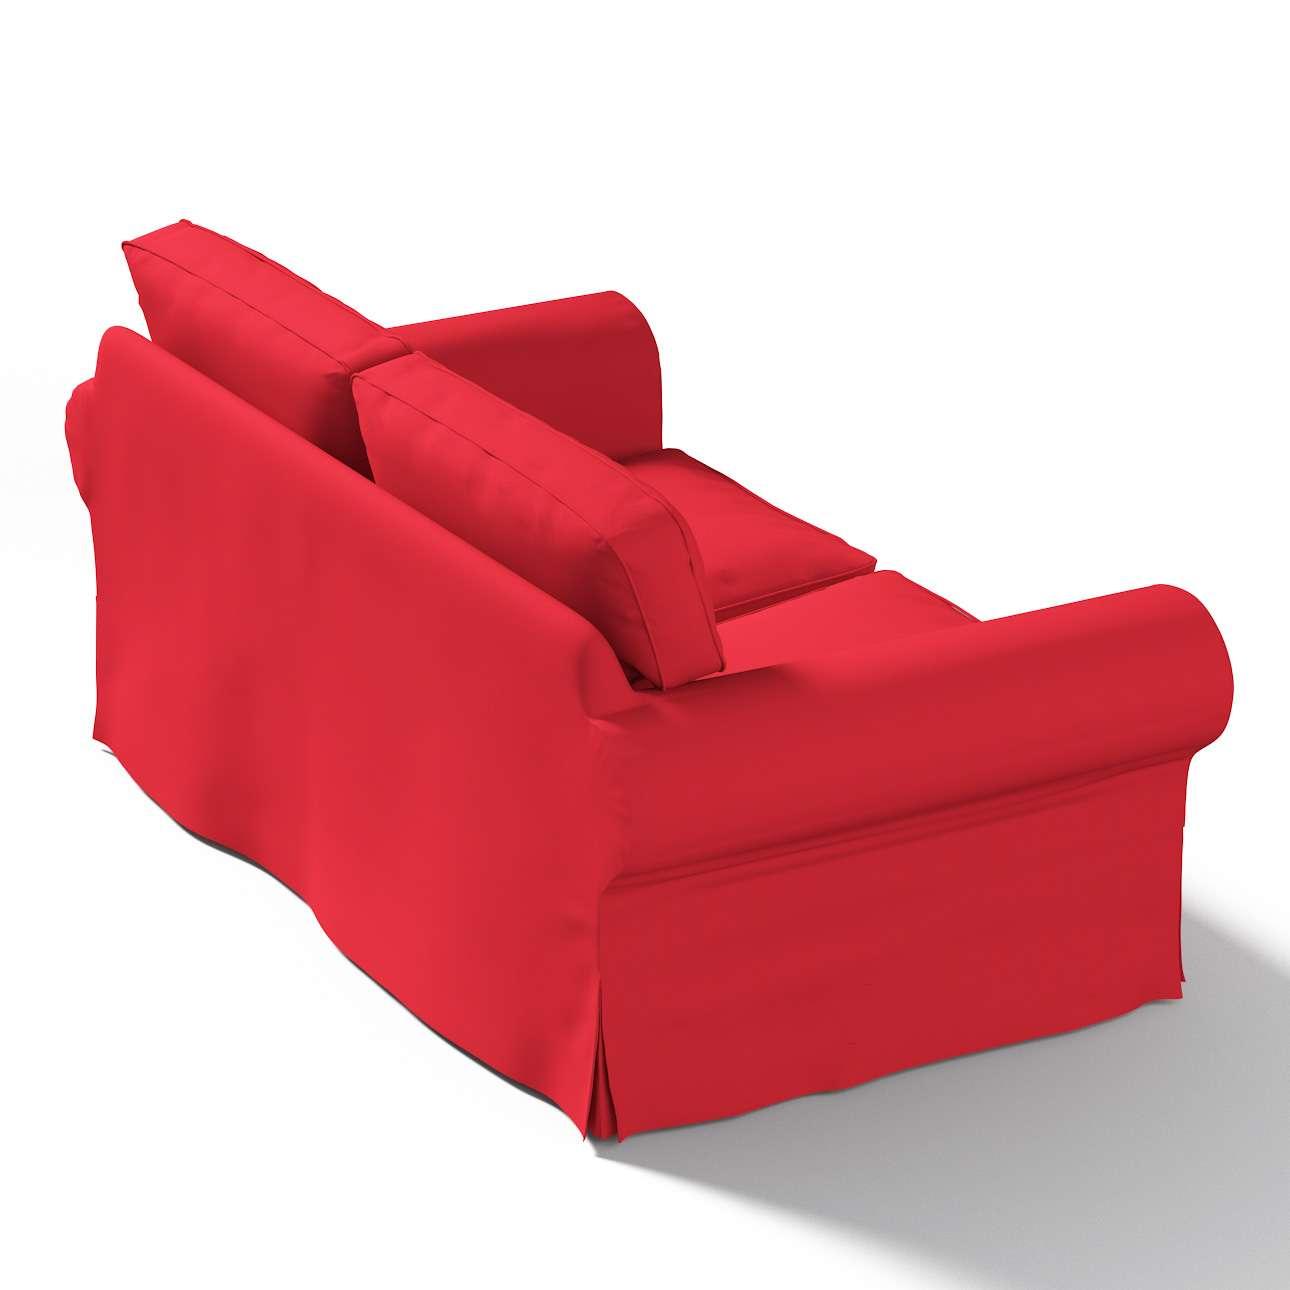 Ektorp 2-Sitzer Sofabezug nicht ausklappbar Sofabezug für  Ektorp 2-Sitzer nicht ausklappbar von der Kollektion Cotton Panama, Stoff: 702-04